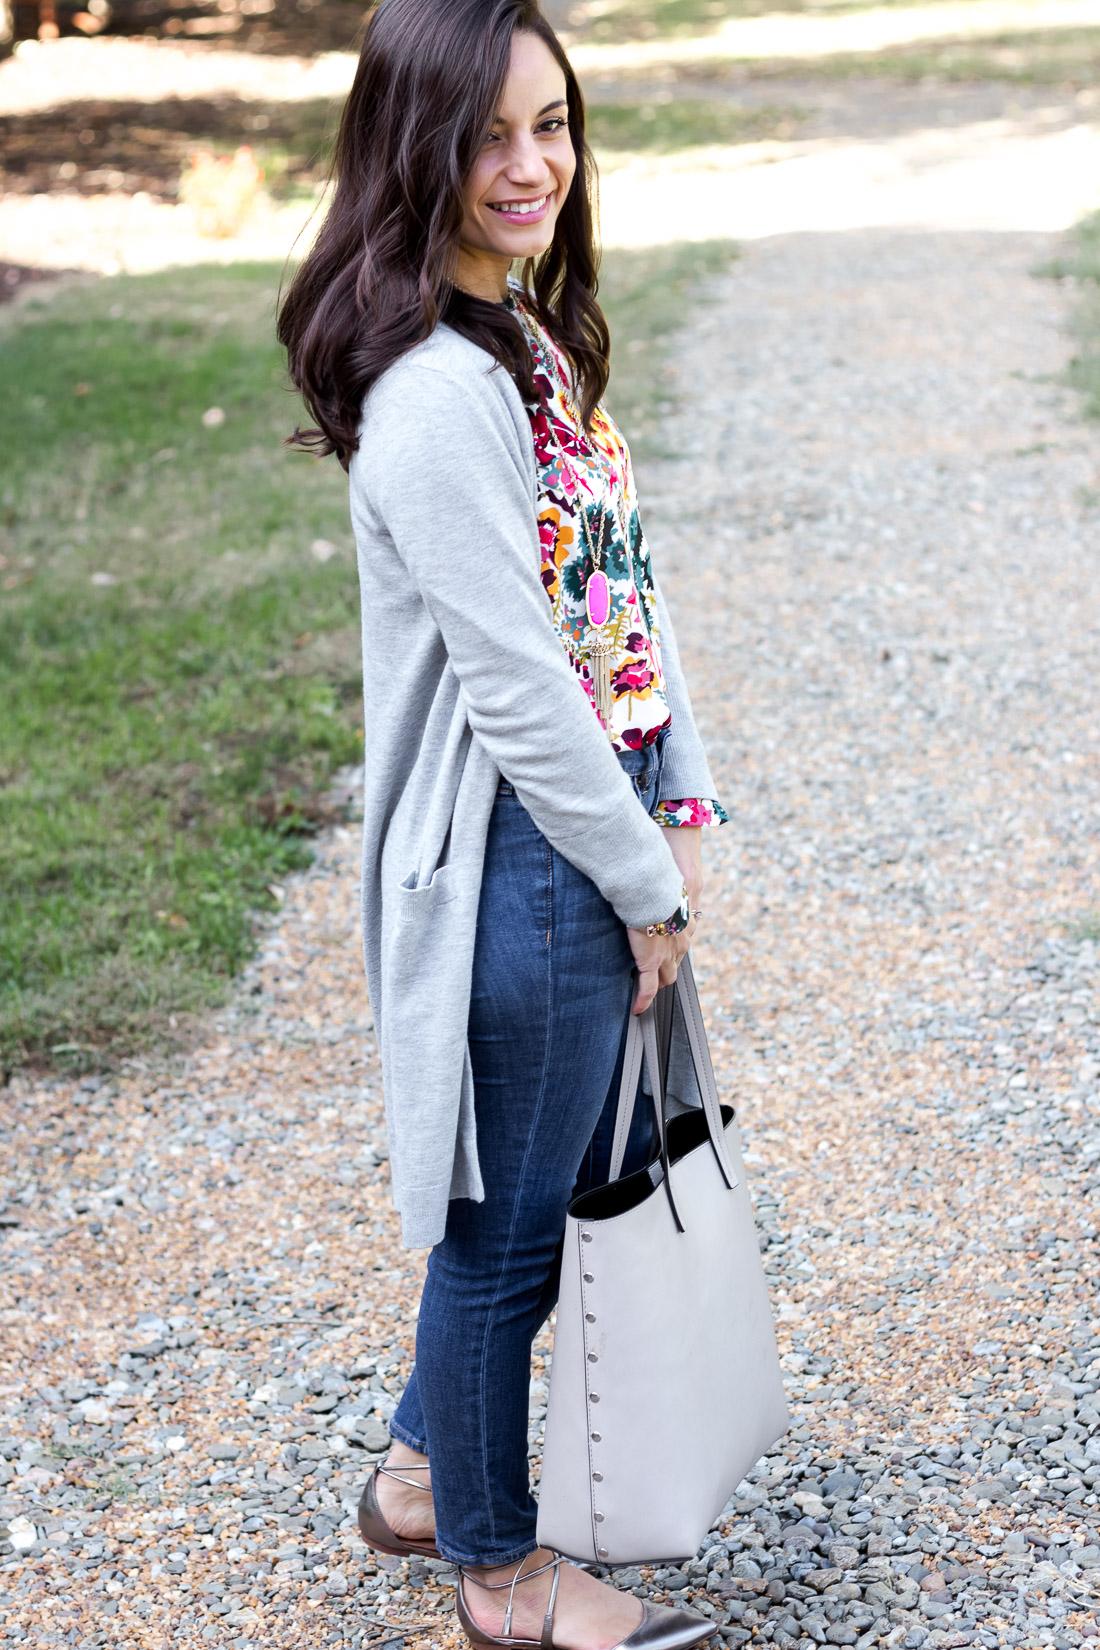 Petite Style Blogger Brooke of Pumps & Push-Ups